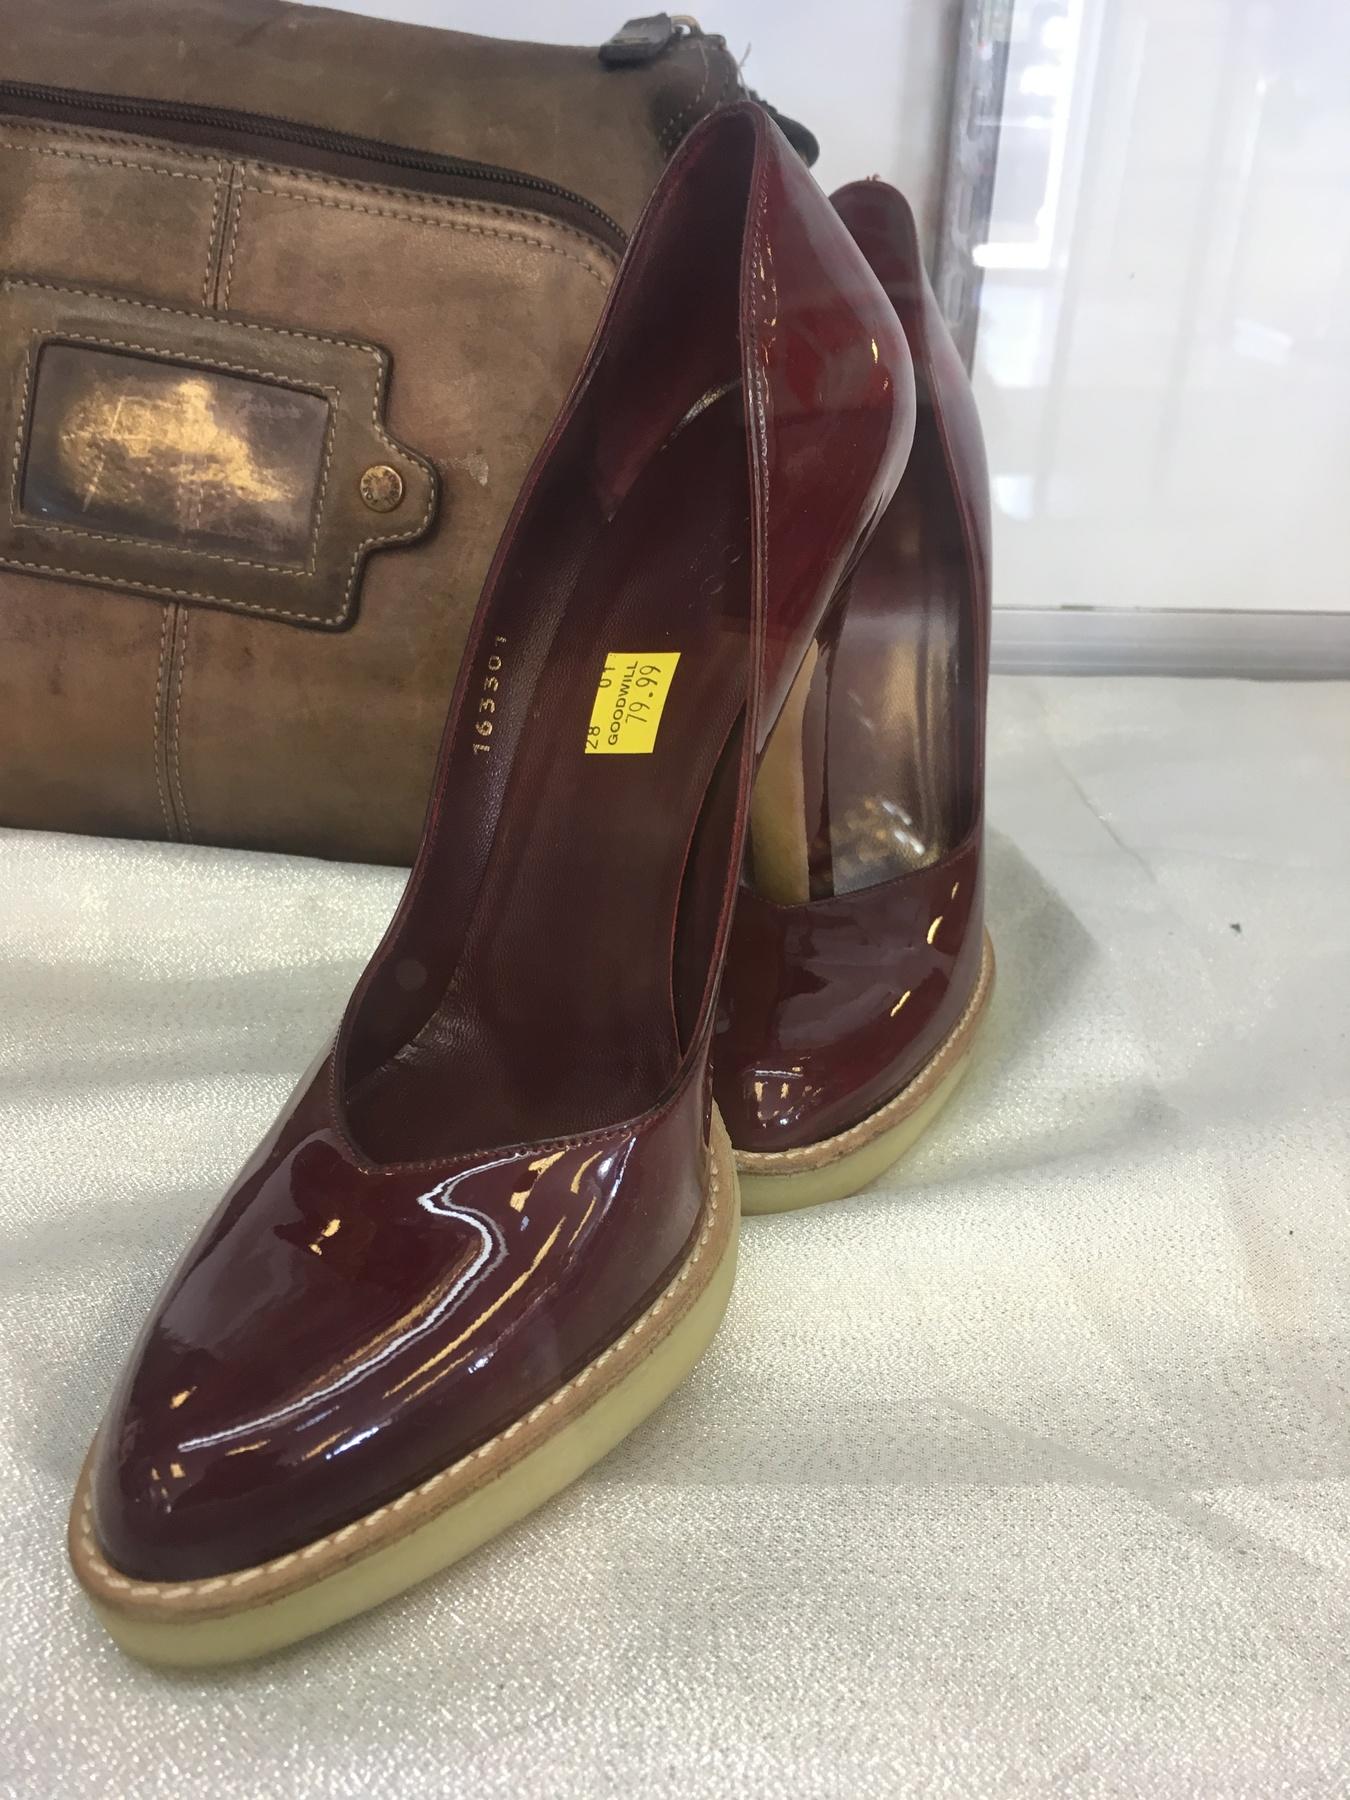 burgundy Gucci pumps found at Waldorf Goodwill